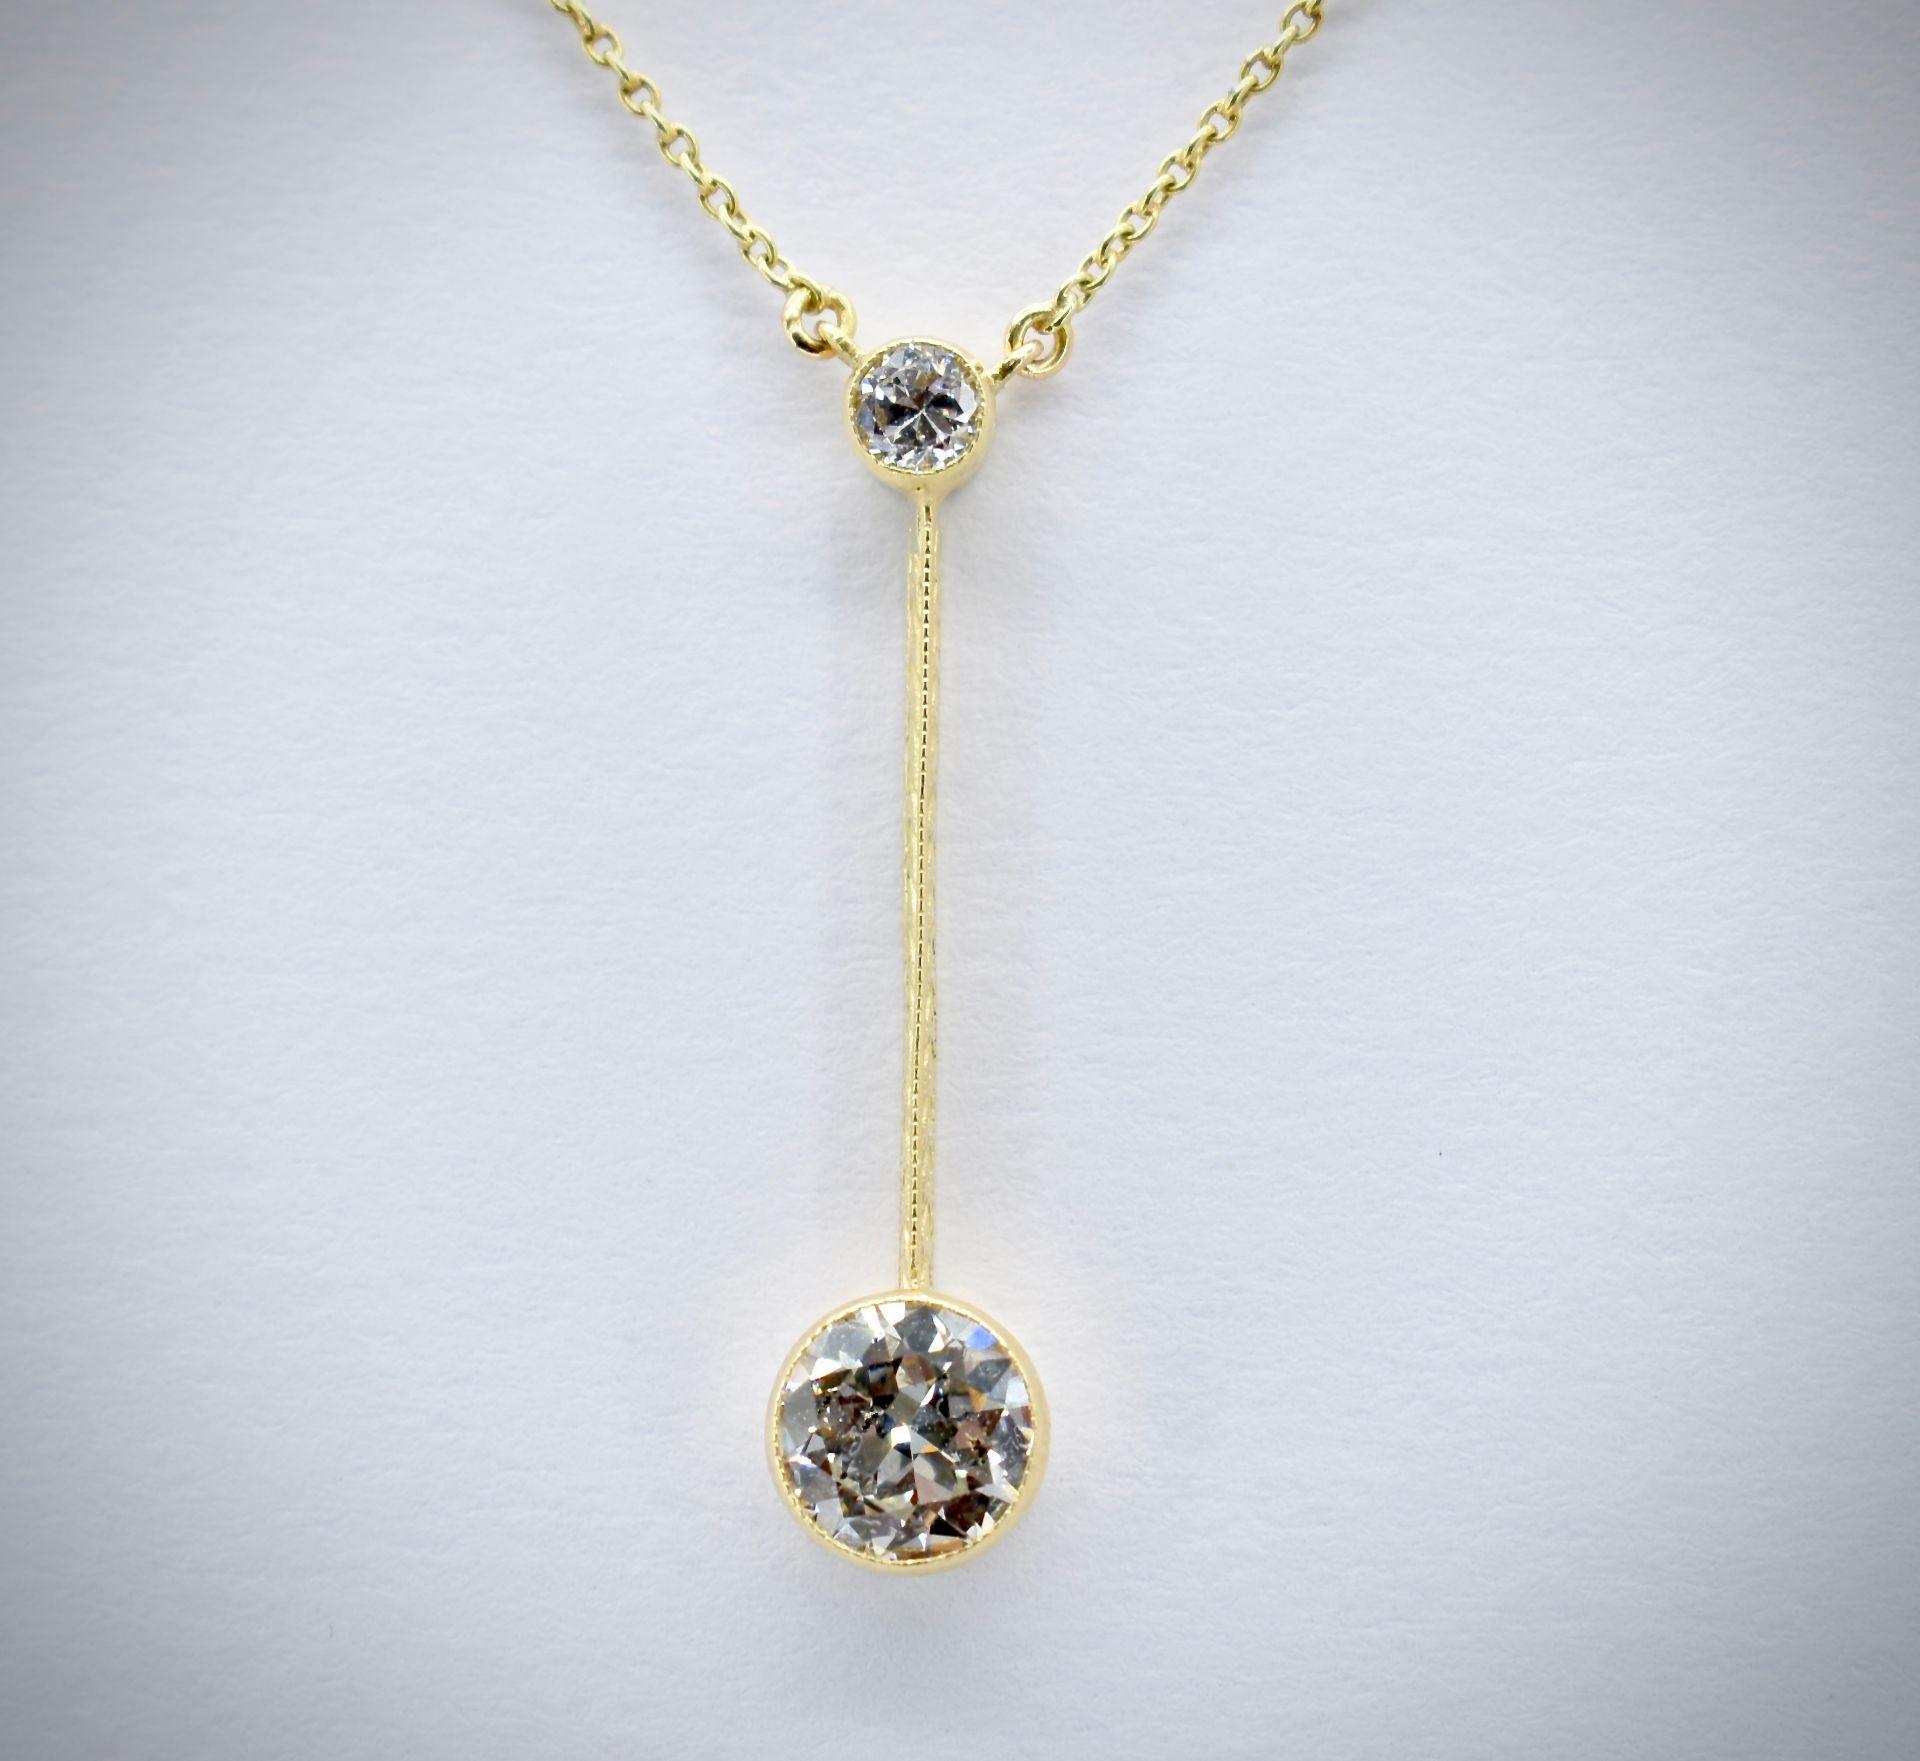 14ct Gold & Diamond Pendant Necklace